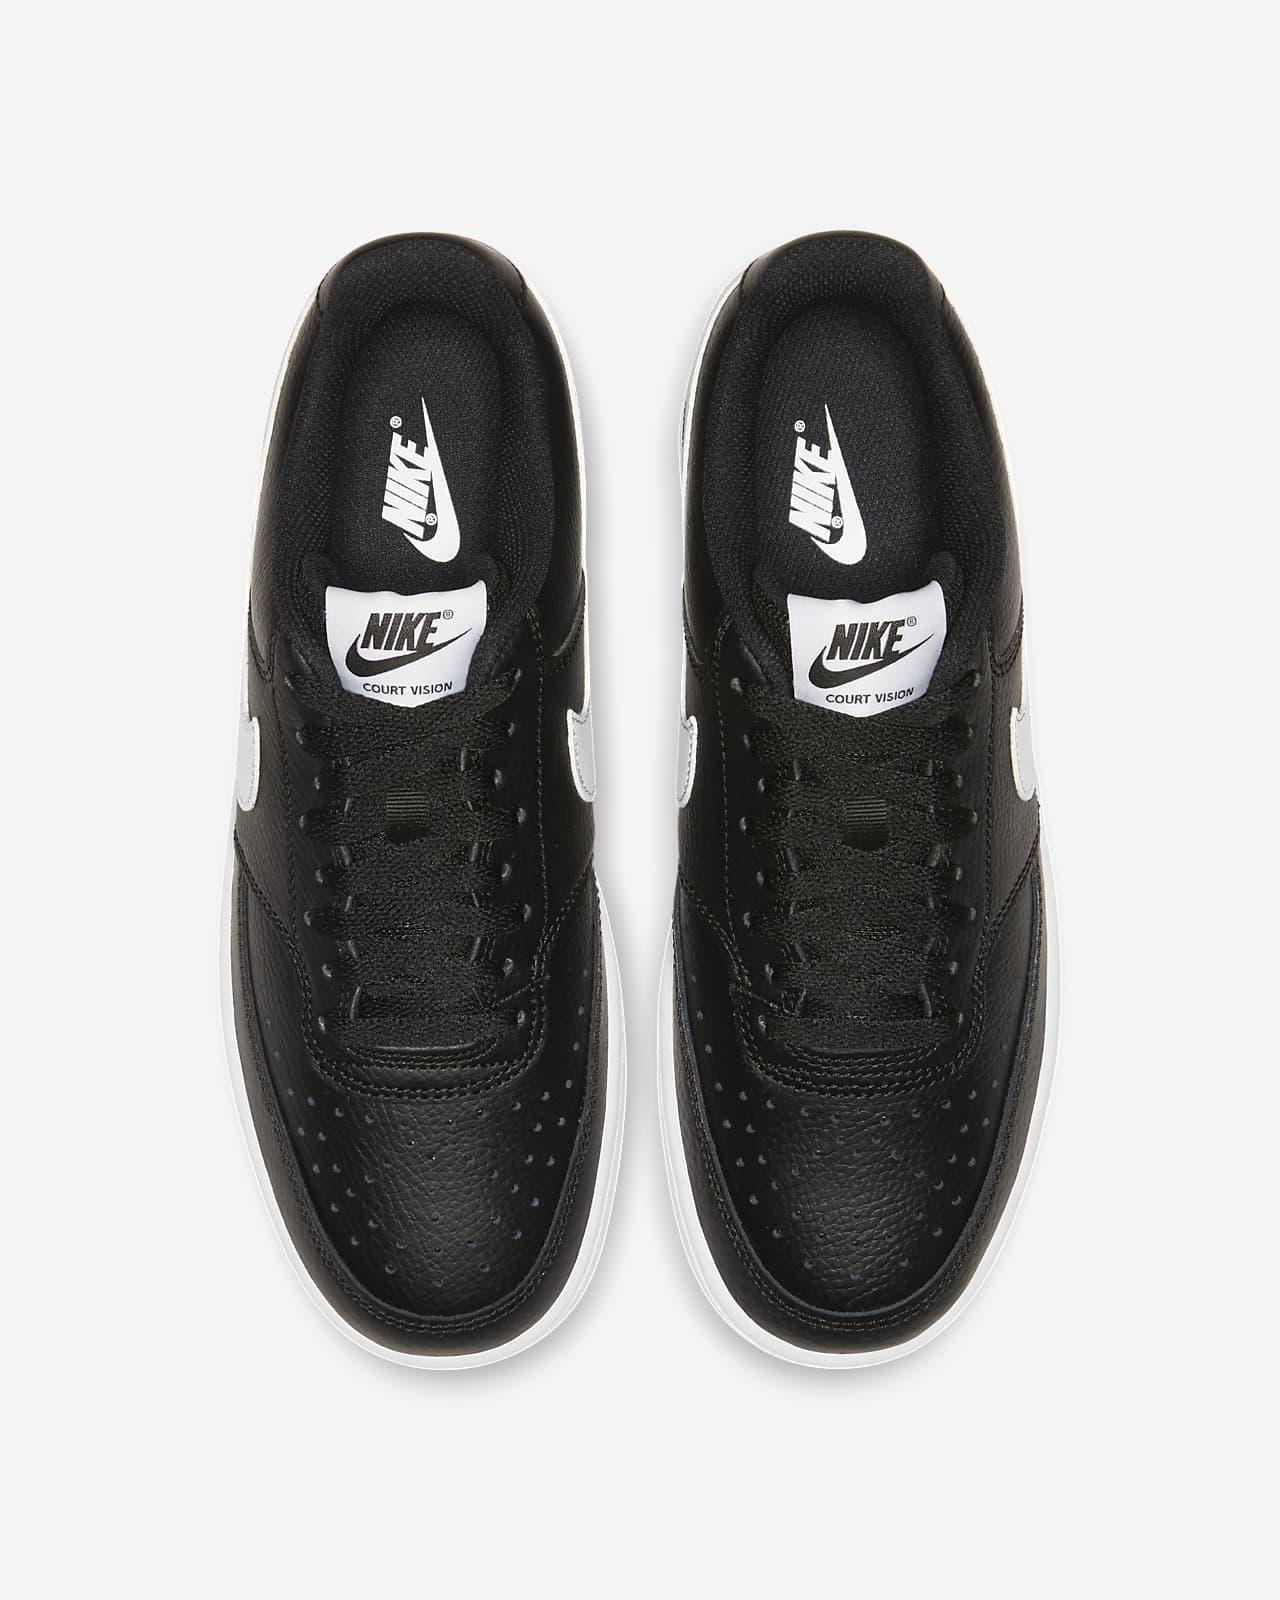 Nike Court Vision Low Damenschuh